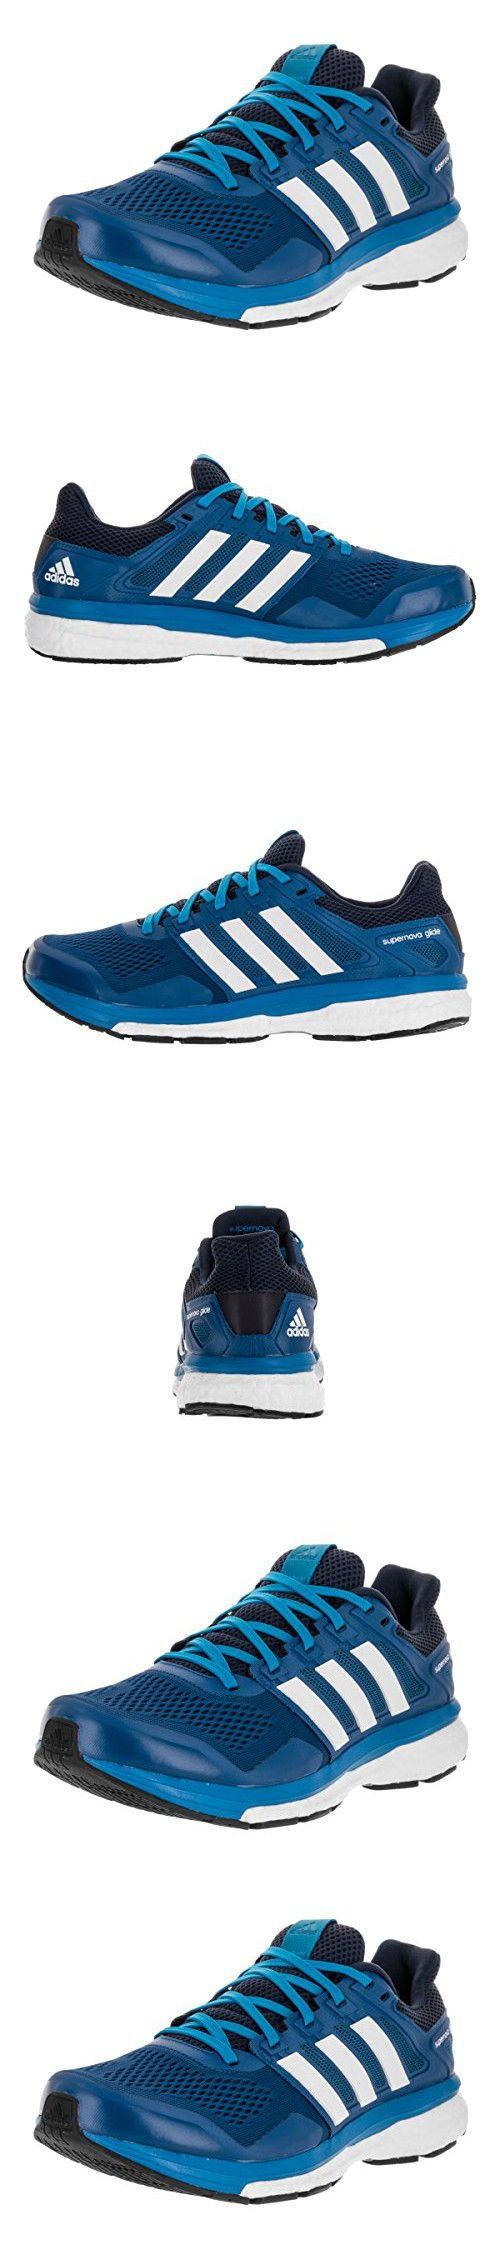 Adidas Supernova Glide 8 Running Shoe - Men's EQT Blue/White/Collegiate Navy, 9.0